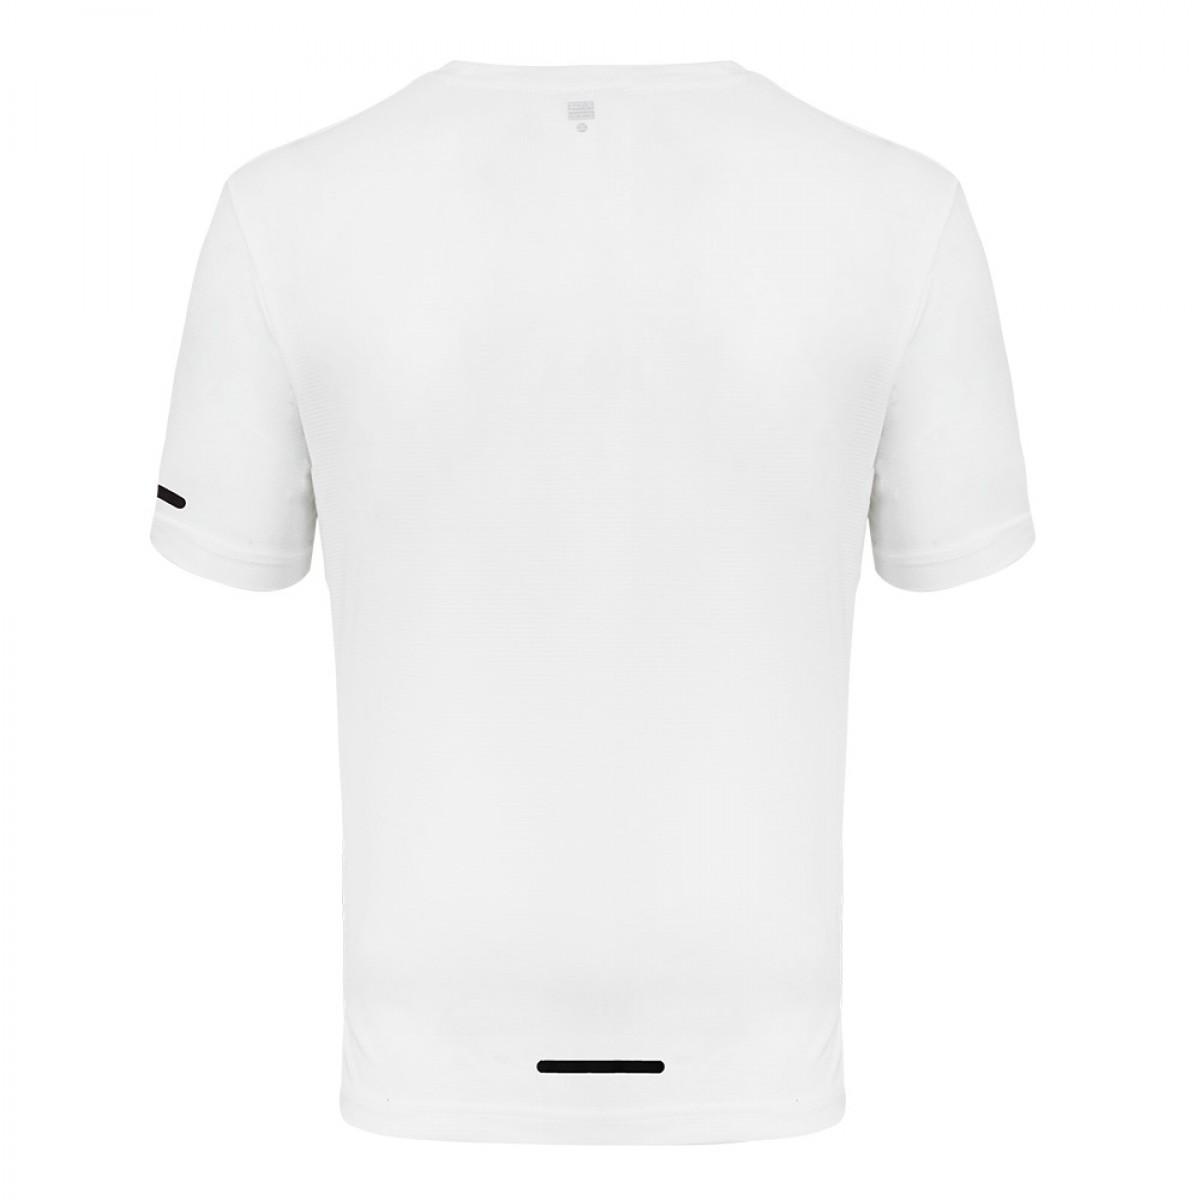 men-knitted-round-neck-logo-t-shirt-kkrnlt15935-7a